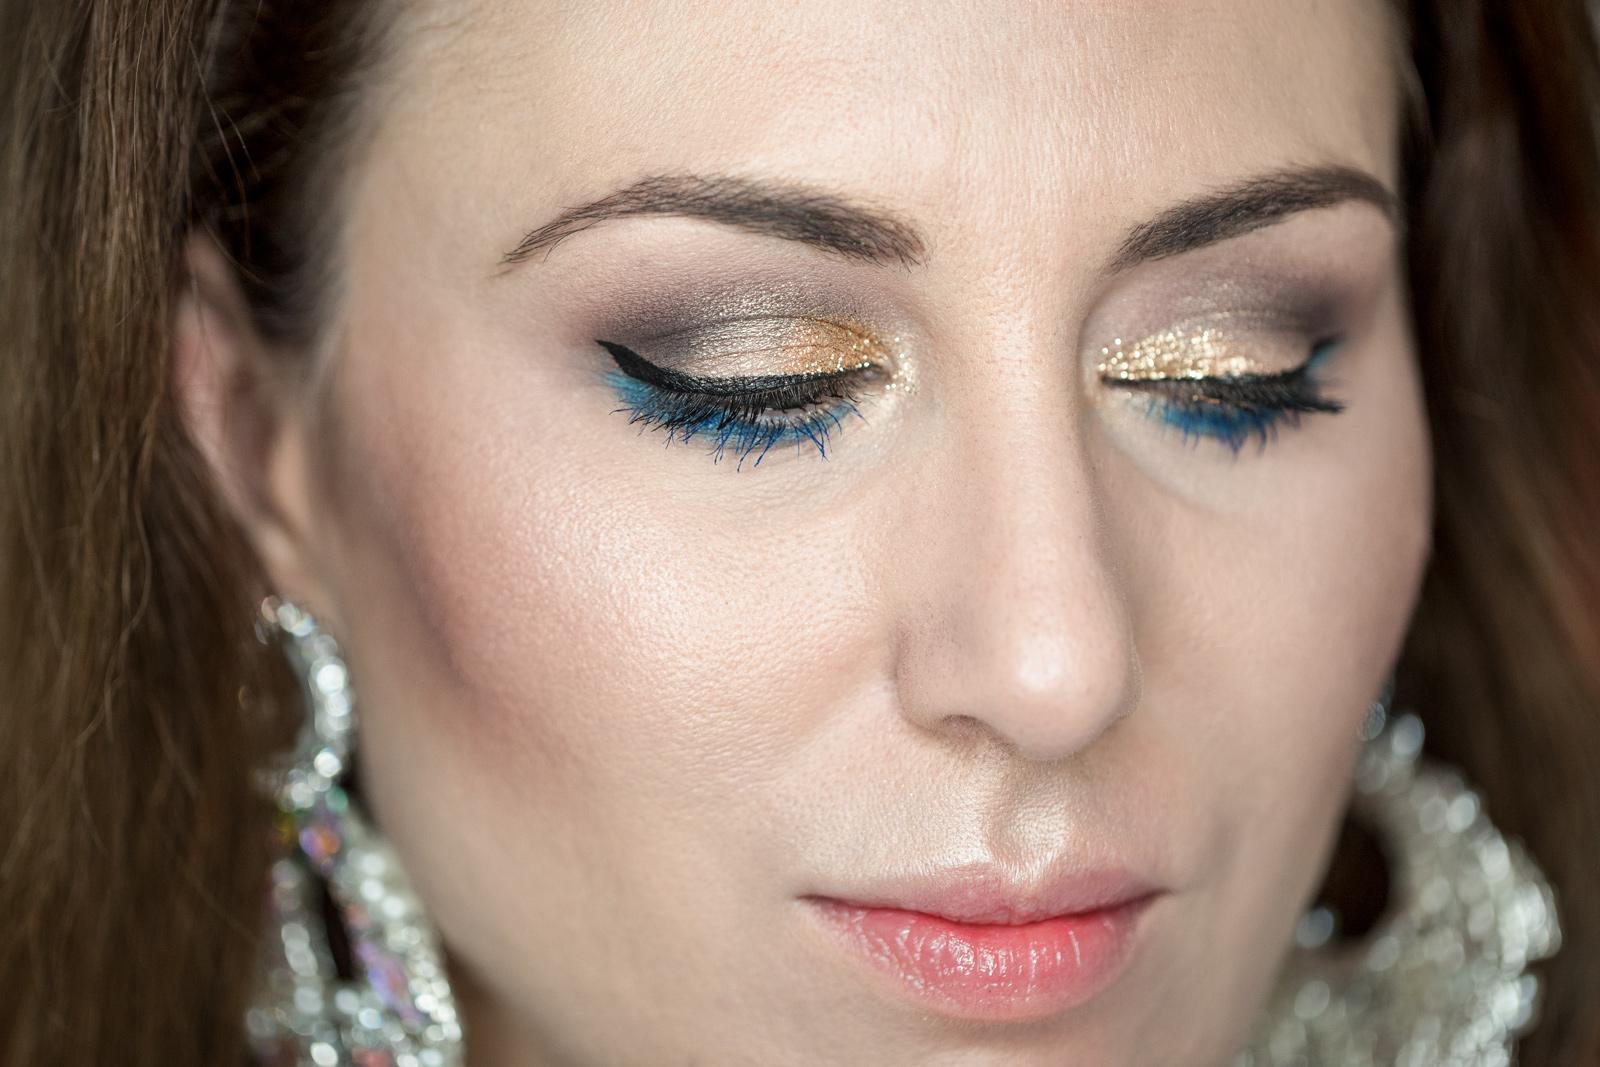 Foto-by-Nadja-Nemetz-Wien-wienerblogger-blogger-beautyblogger_lifestyleblogger-lifestyle-beauty-peacock-maccosmetics-mac-cosmetics-limited-edition-3